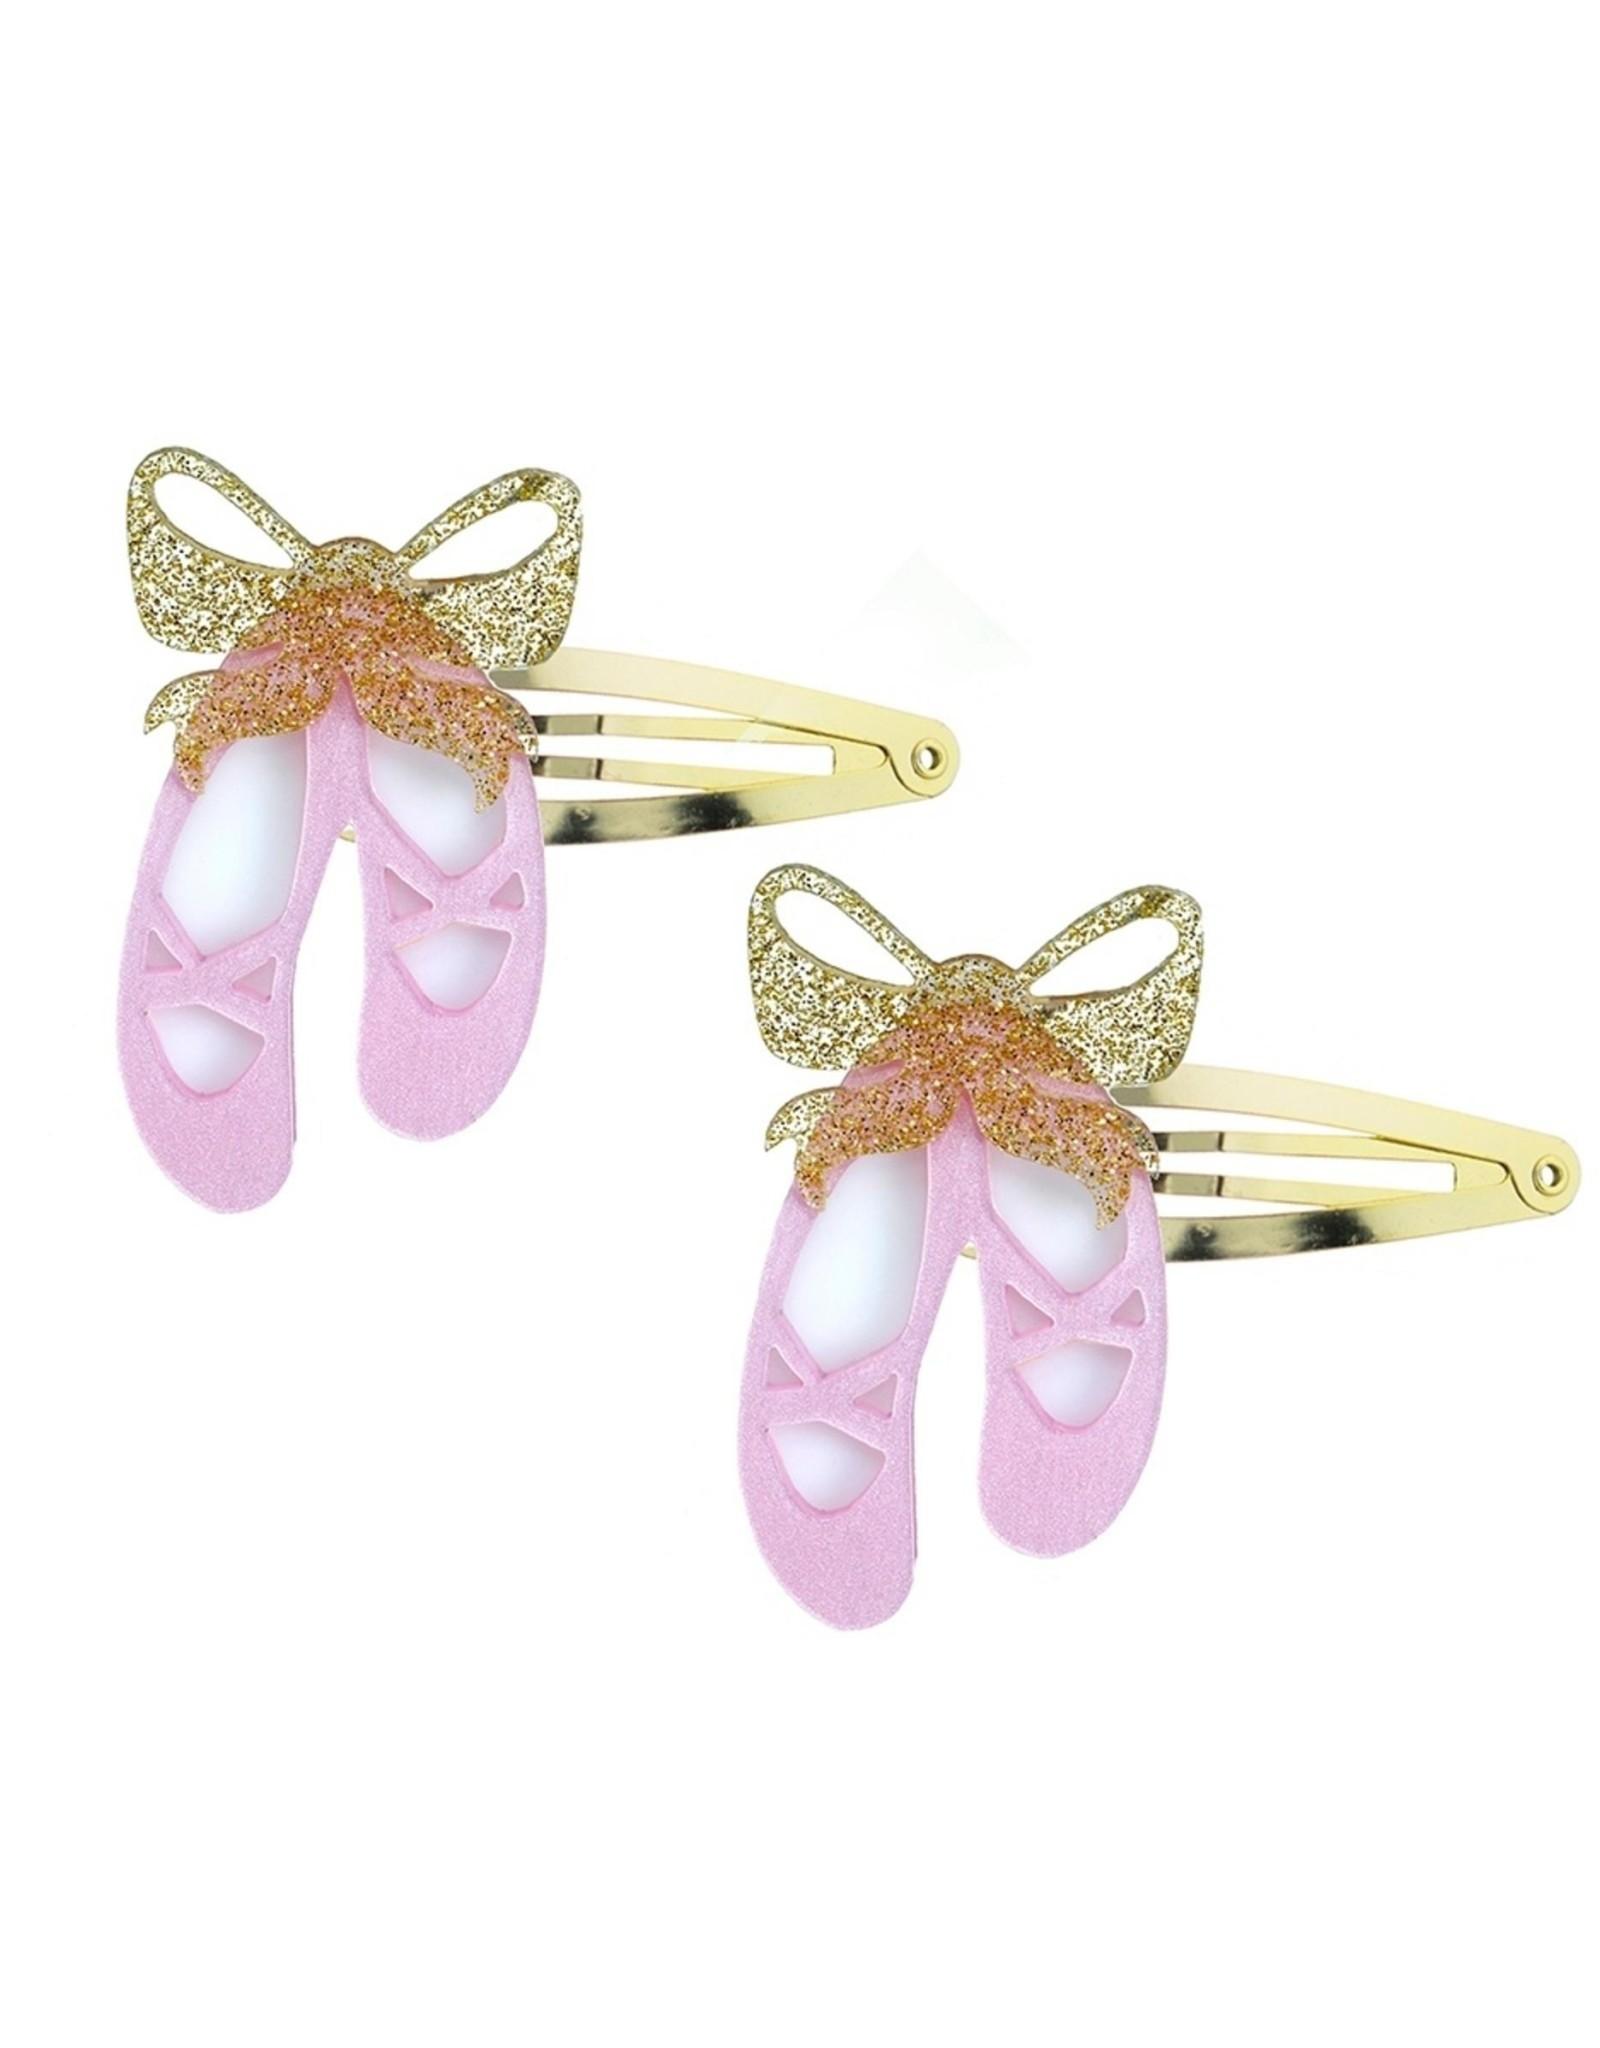 Lillies & Roses Hair Clip Ballet Slipper Snap